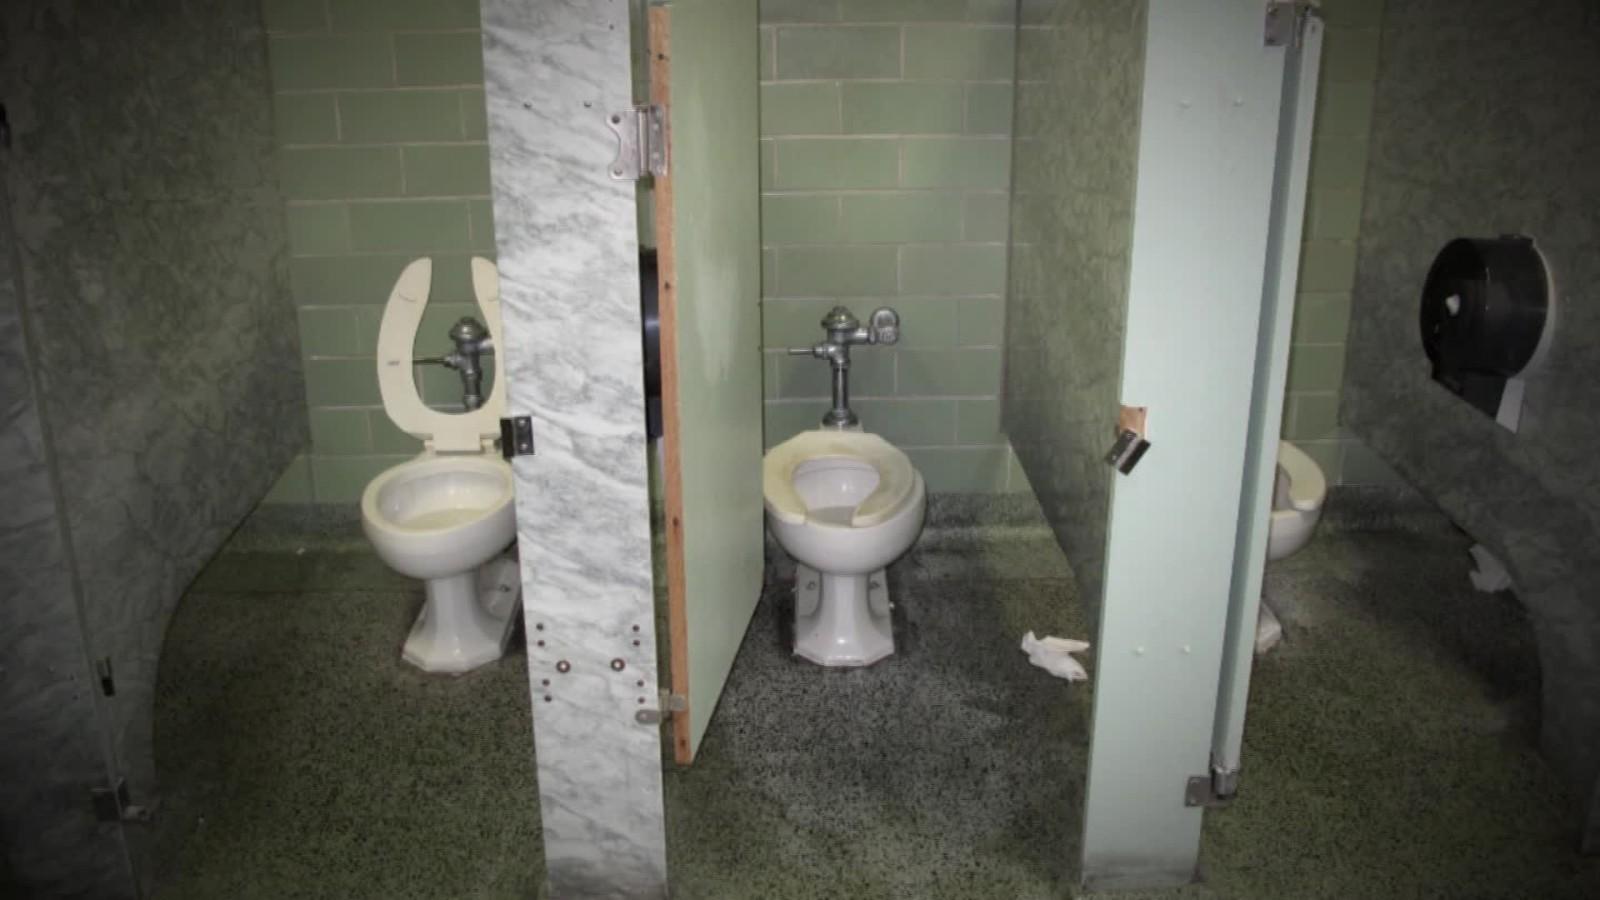 Elementary school bathroom urinal - Elementary School Bathroom Urinal 36